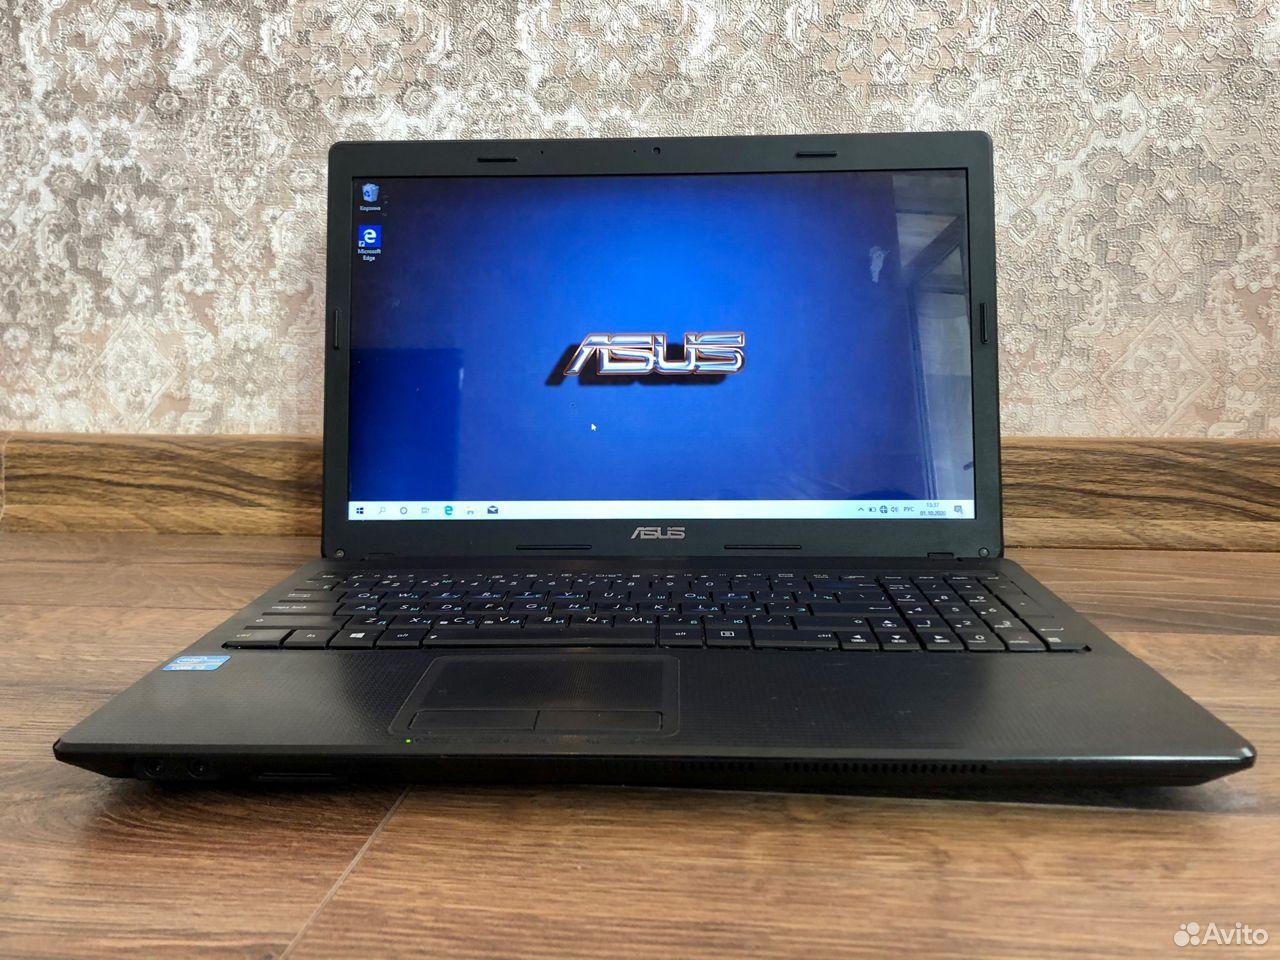 Asus, Core i3, 8 Гб, AMD Radeon HD, 1 Терабайт  89211000351 купить 3